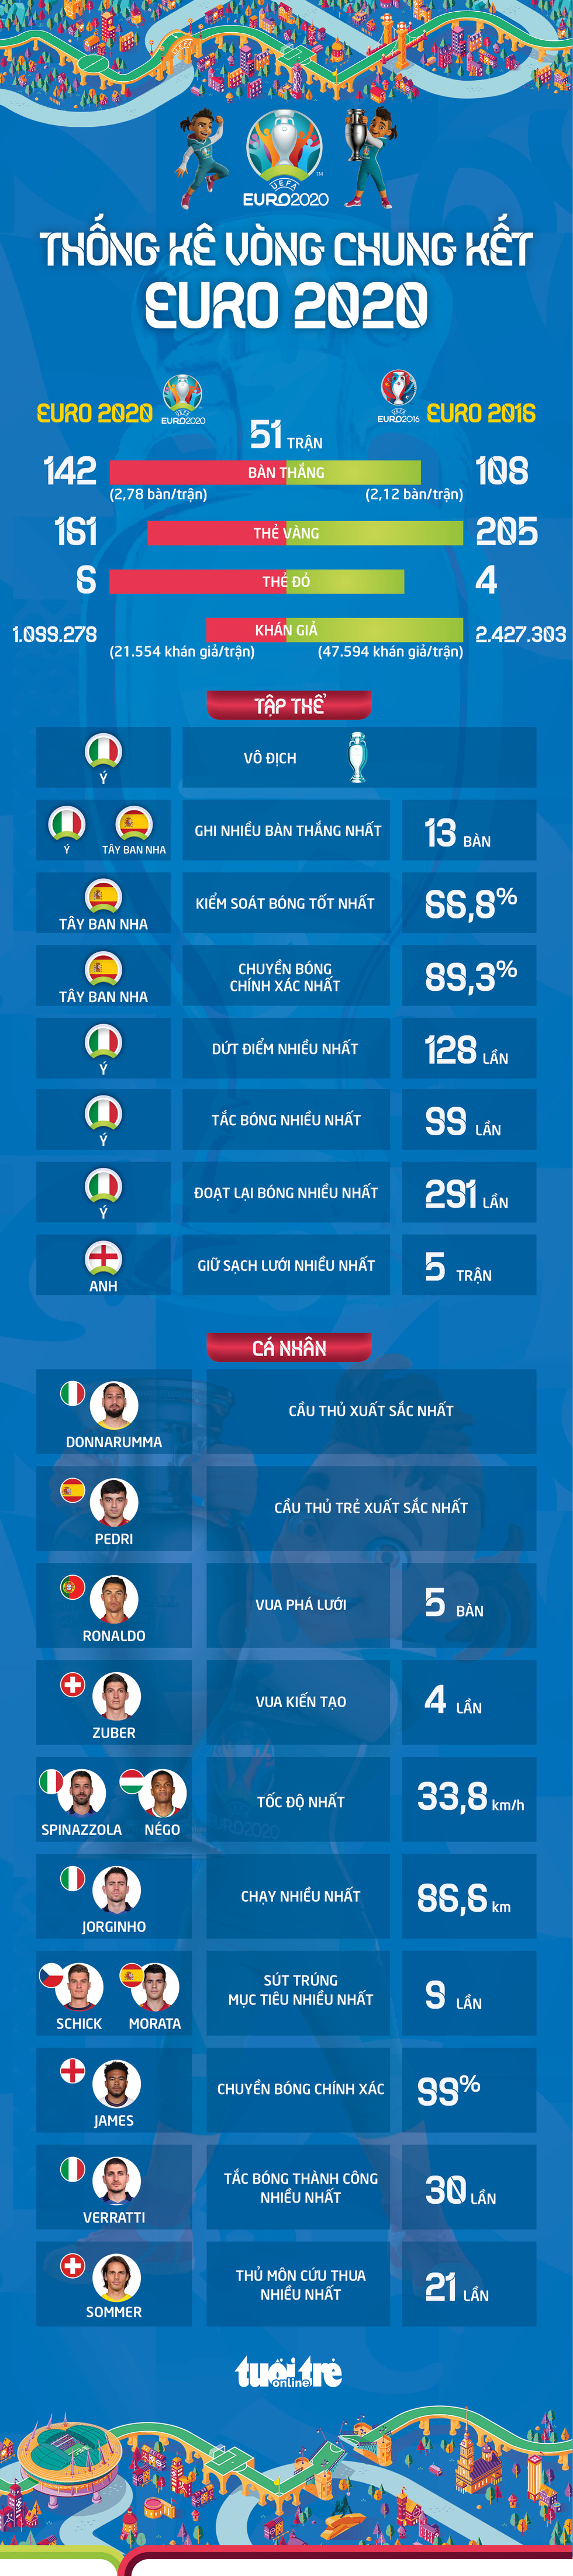 Euro 2020 qua những con số - Ảnh 1.